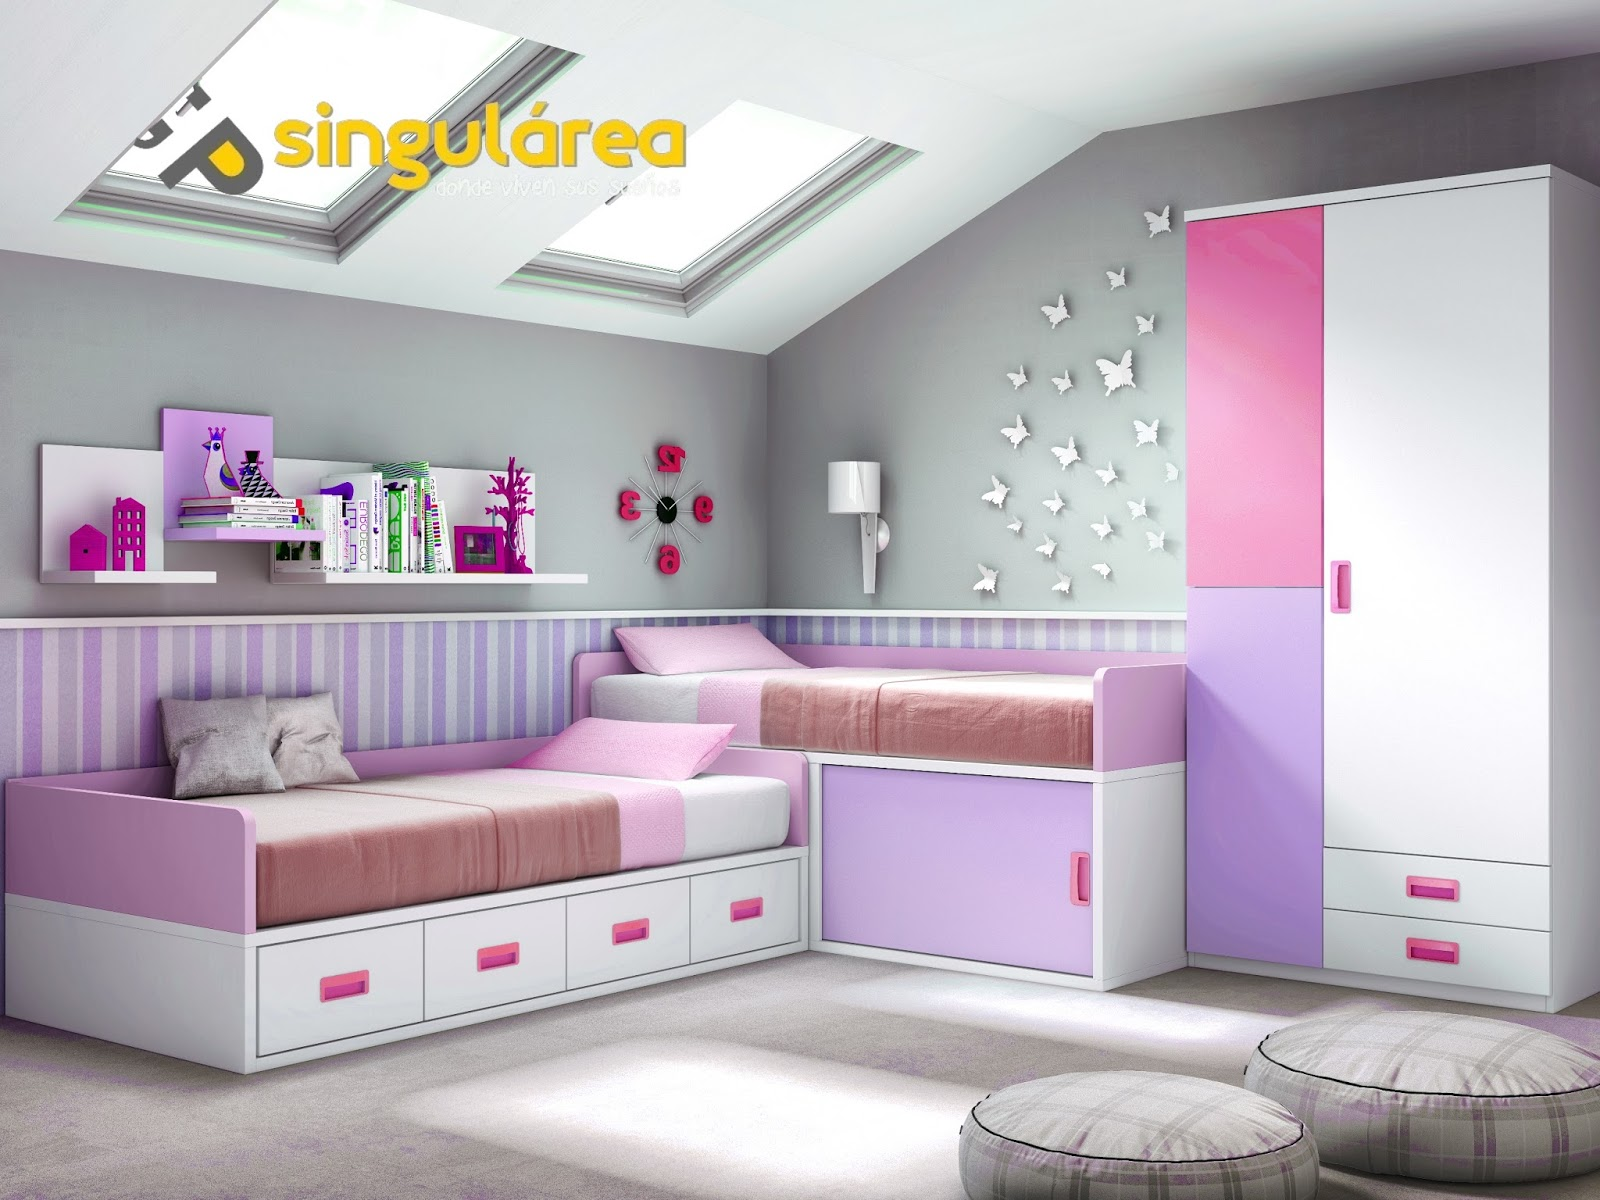 Imagenes dormitorios juveniles cool with imagenes dormitorios juveniles excellent dormitorio - Habitaciones infantiles de dos camas ...